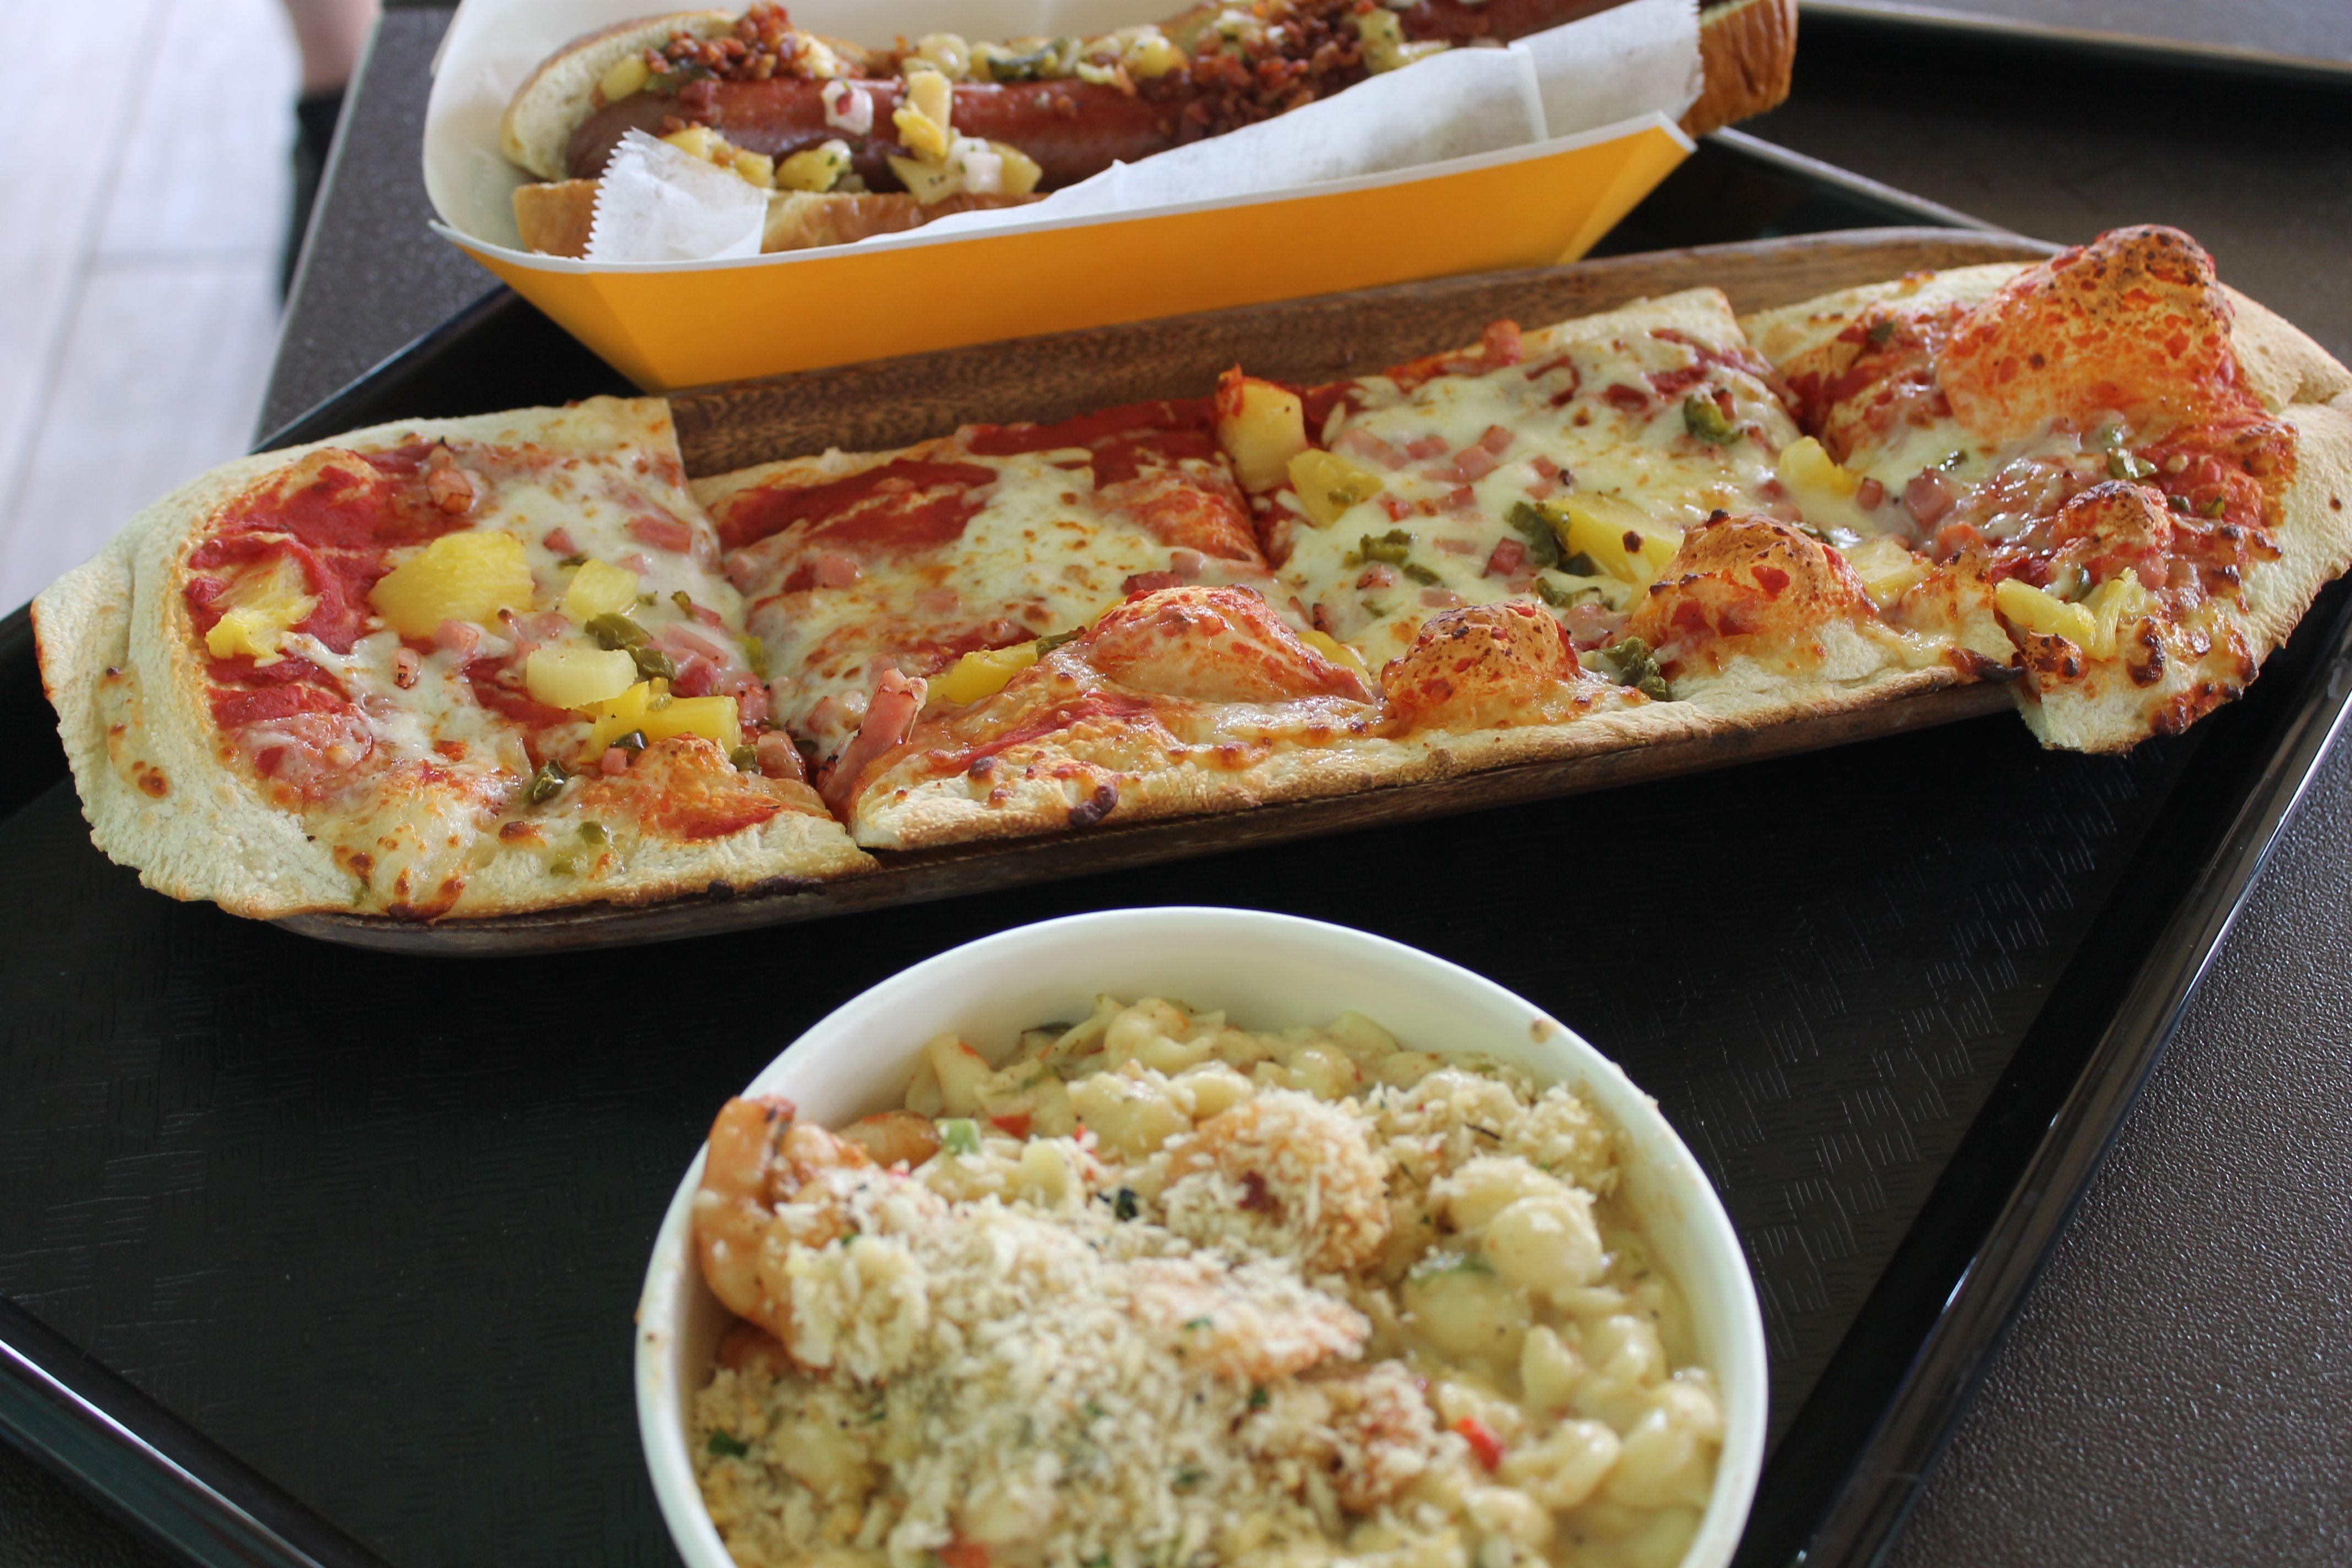 Universal's Volcano Bay Food